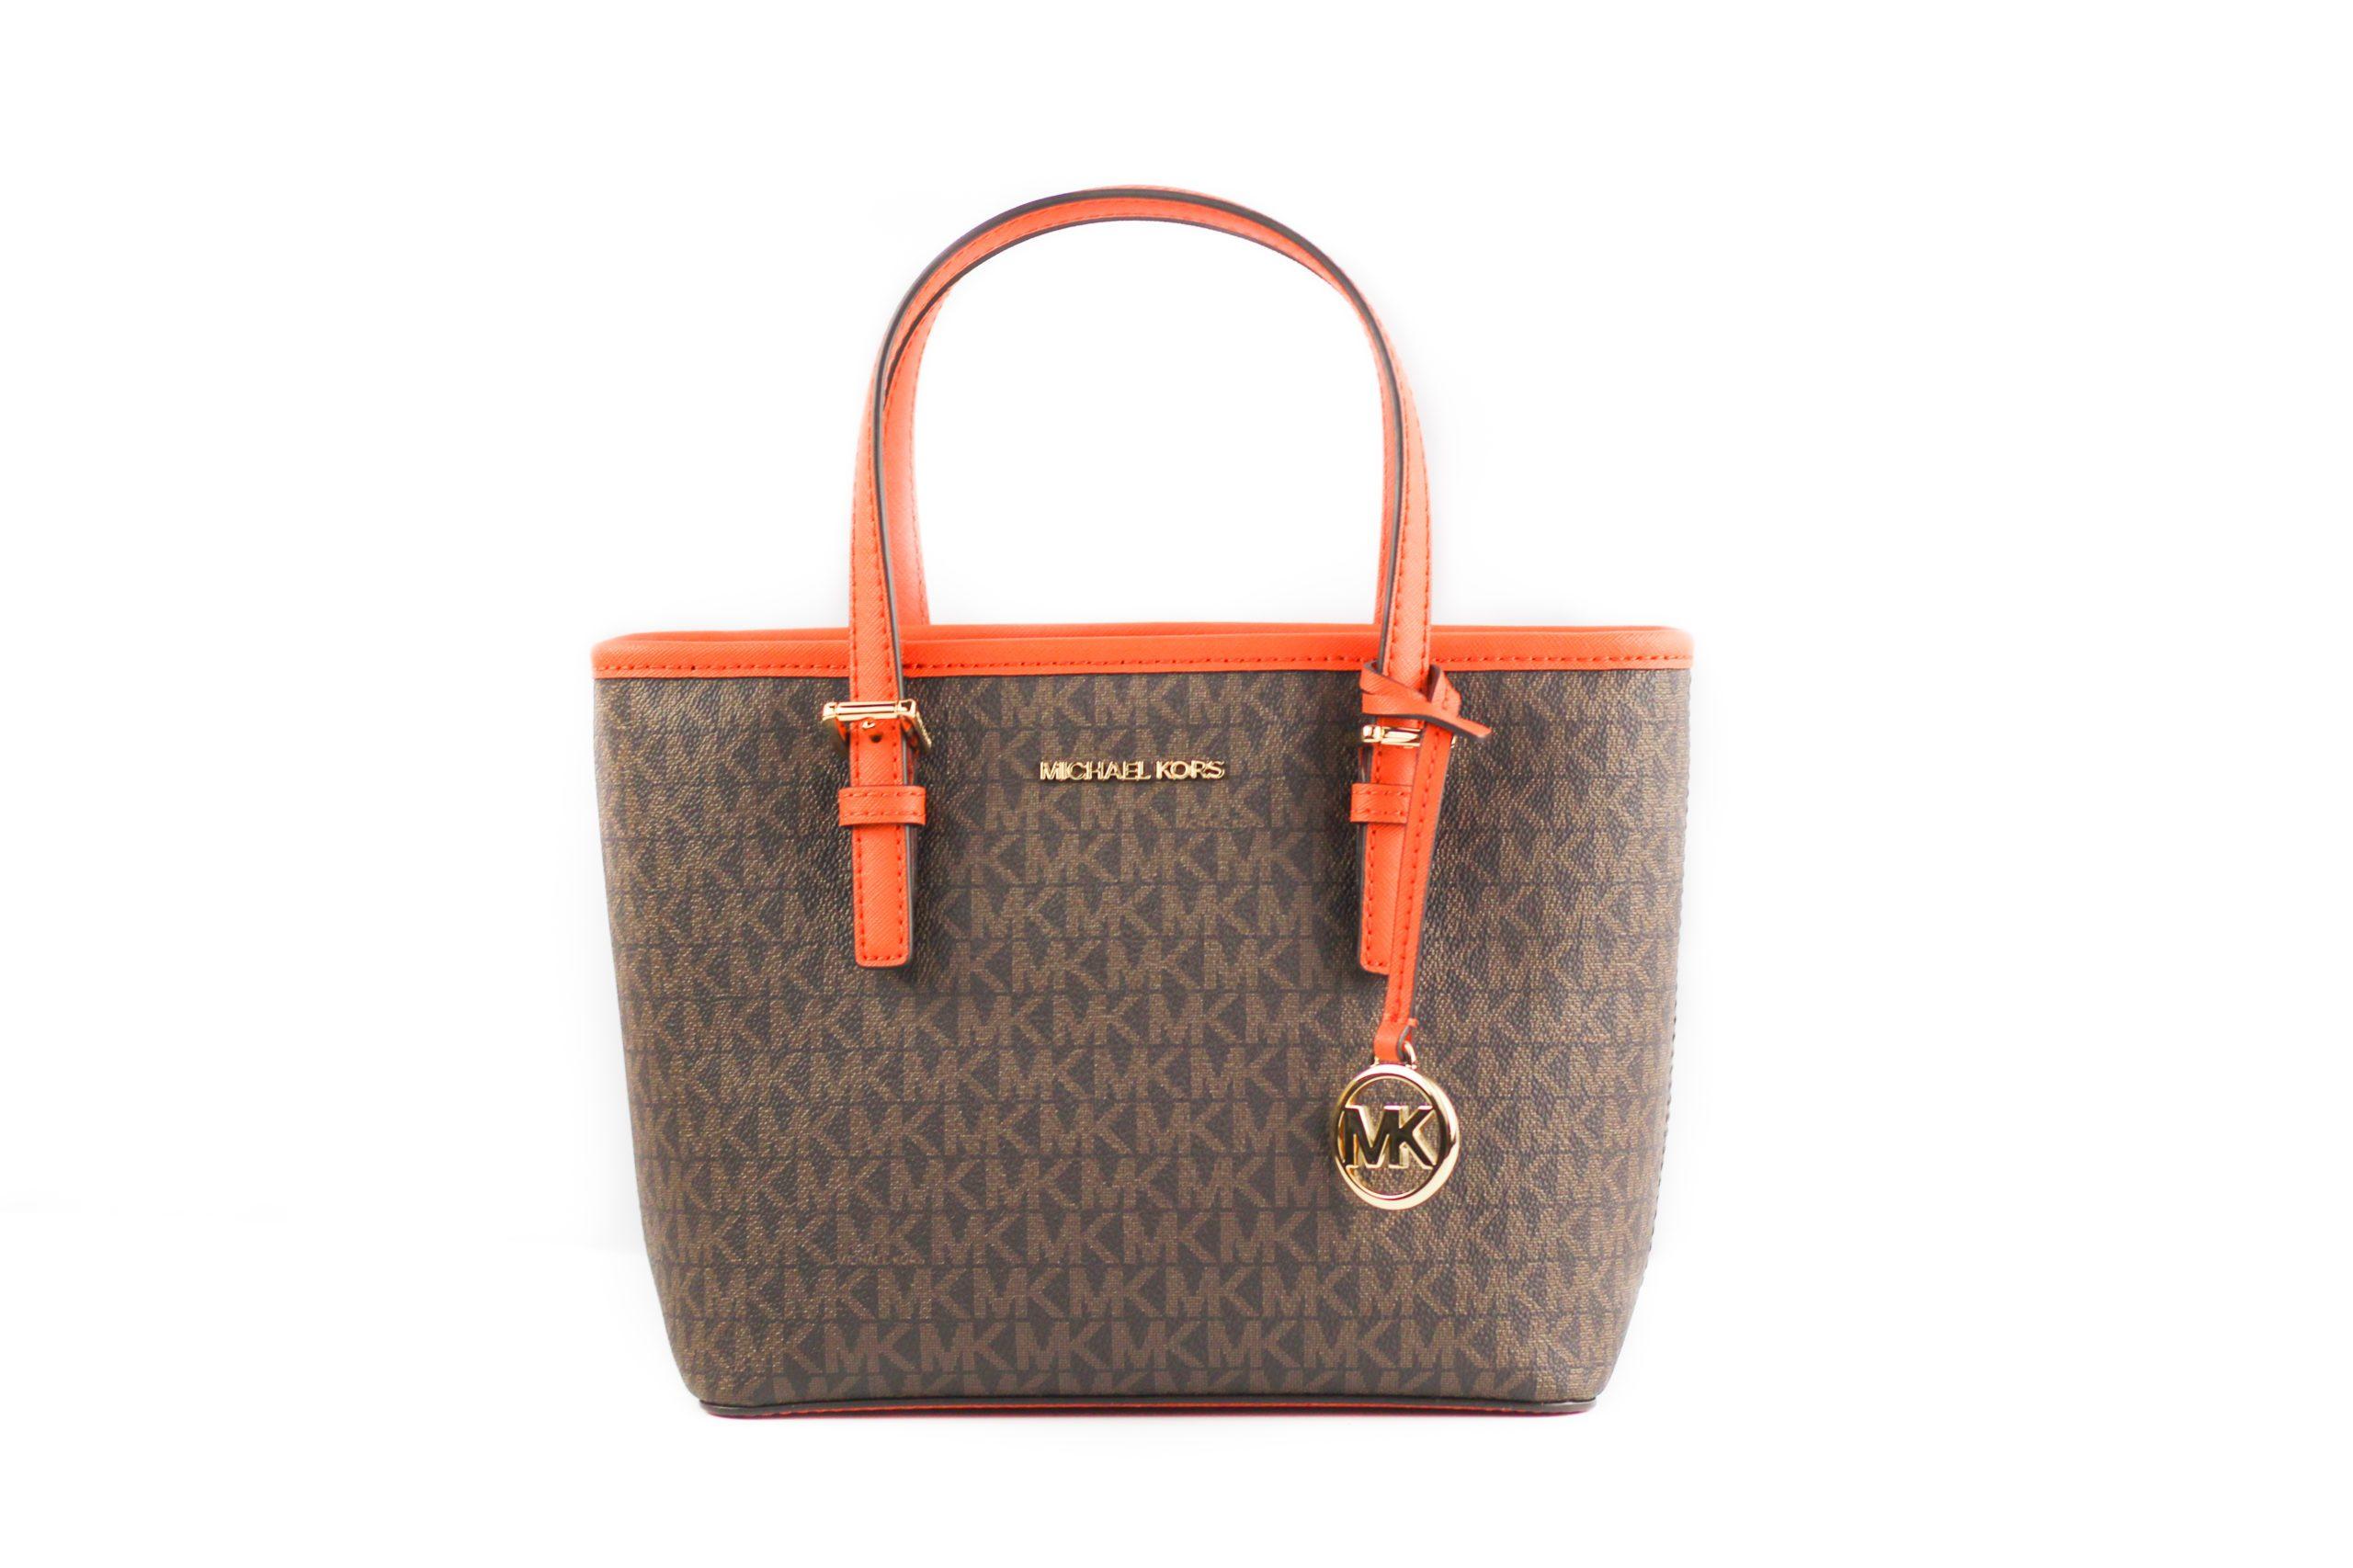 Michael Kors Women's Jet Set Tote Bag Orange 59425